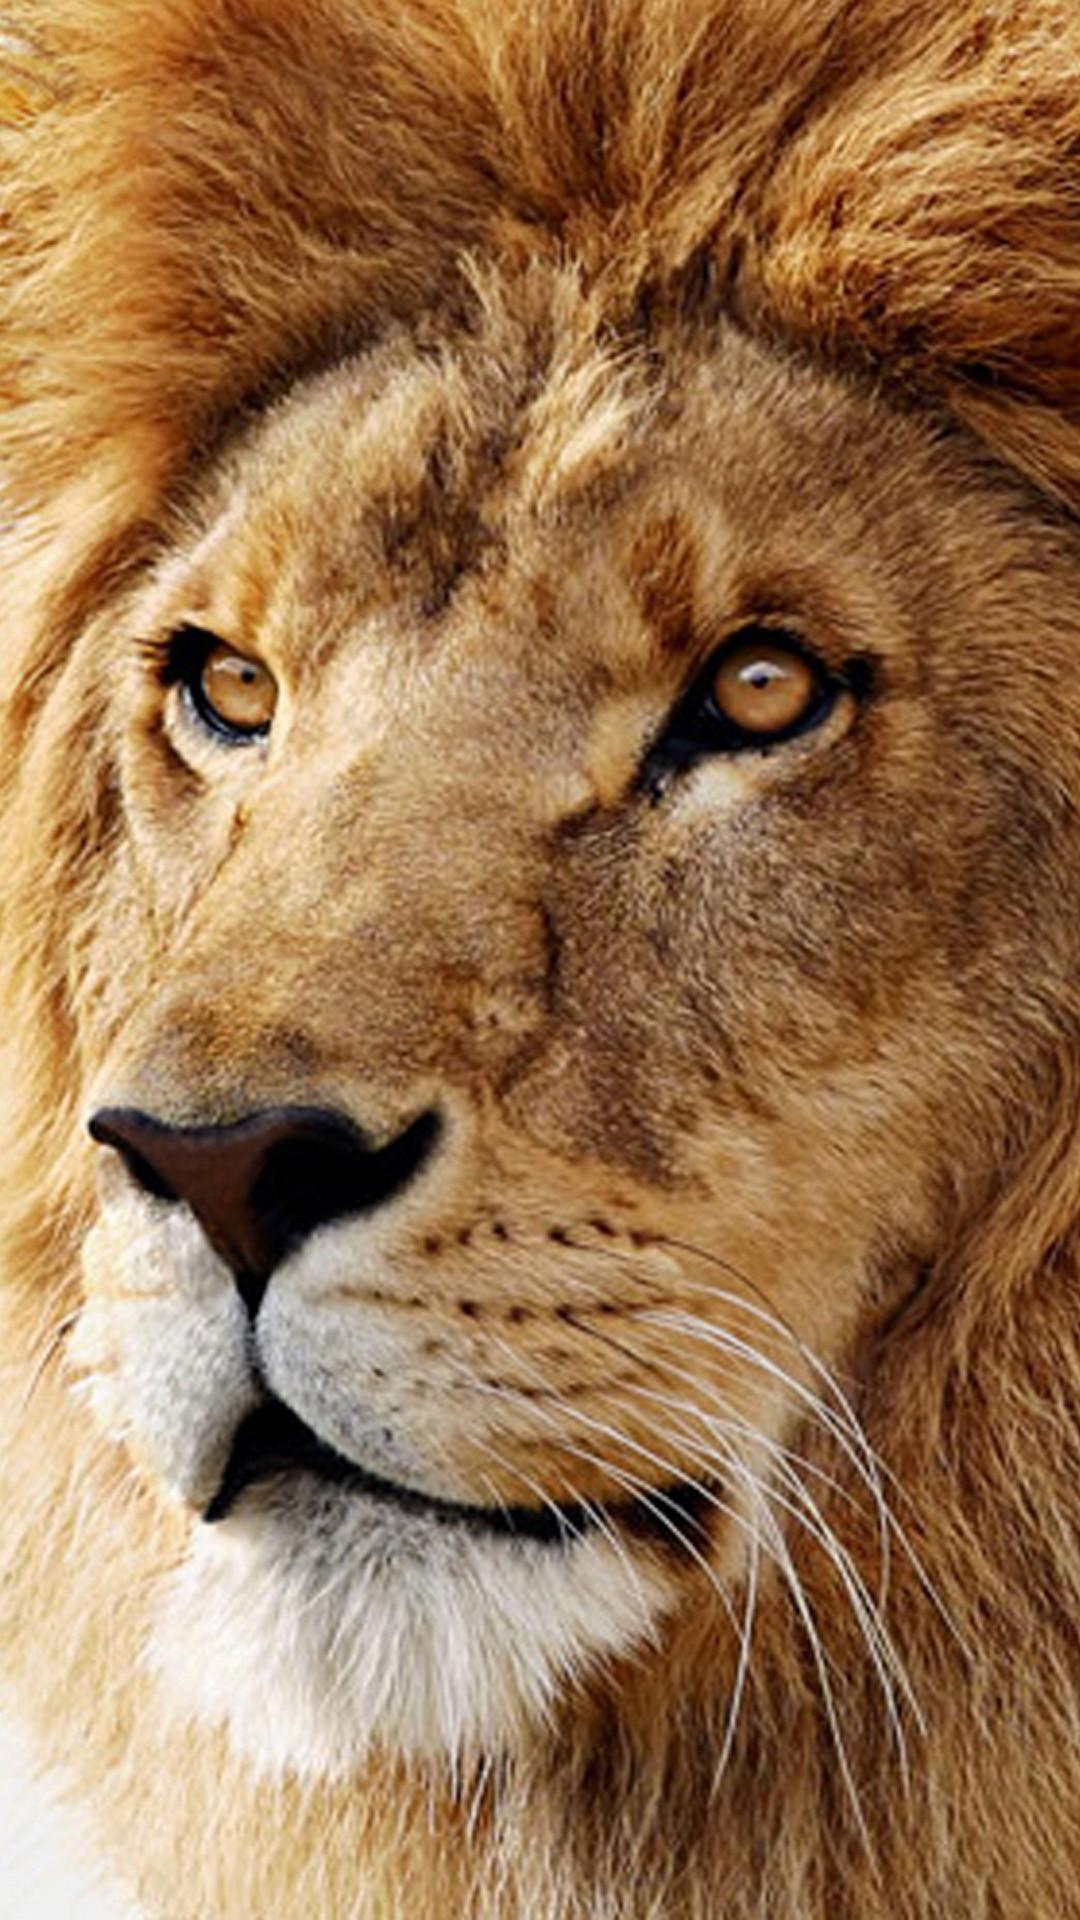 Wallpaper download lion - 1920x1200 Lion Hd Wallpapers Free Wallpaper Downloads Lion Hd Desktop 1920 1200 Lion Wallpaper